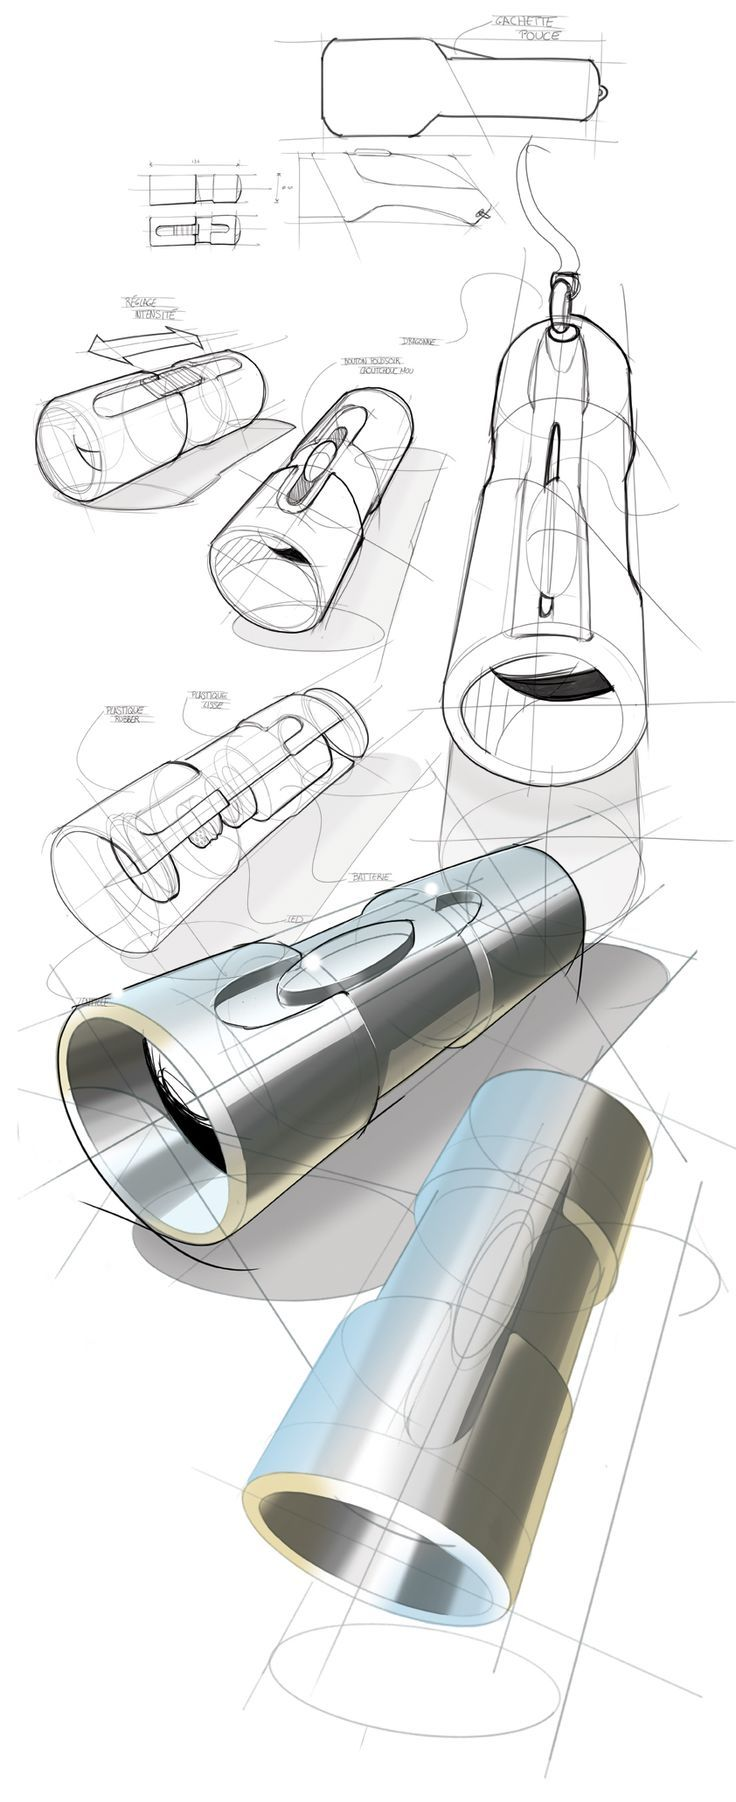 I Will Convert Your Draft Design Sketches To A Plan In A3 A4 Drafting Calculations Wiirk Com Fre Disenos De Unas Diseno De Interfaces Diseno De Objetos